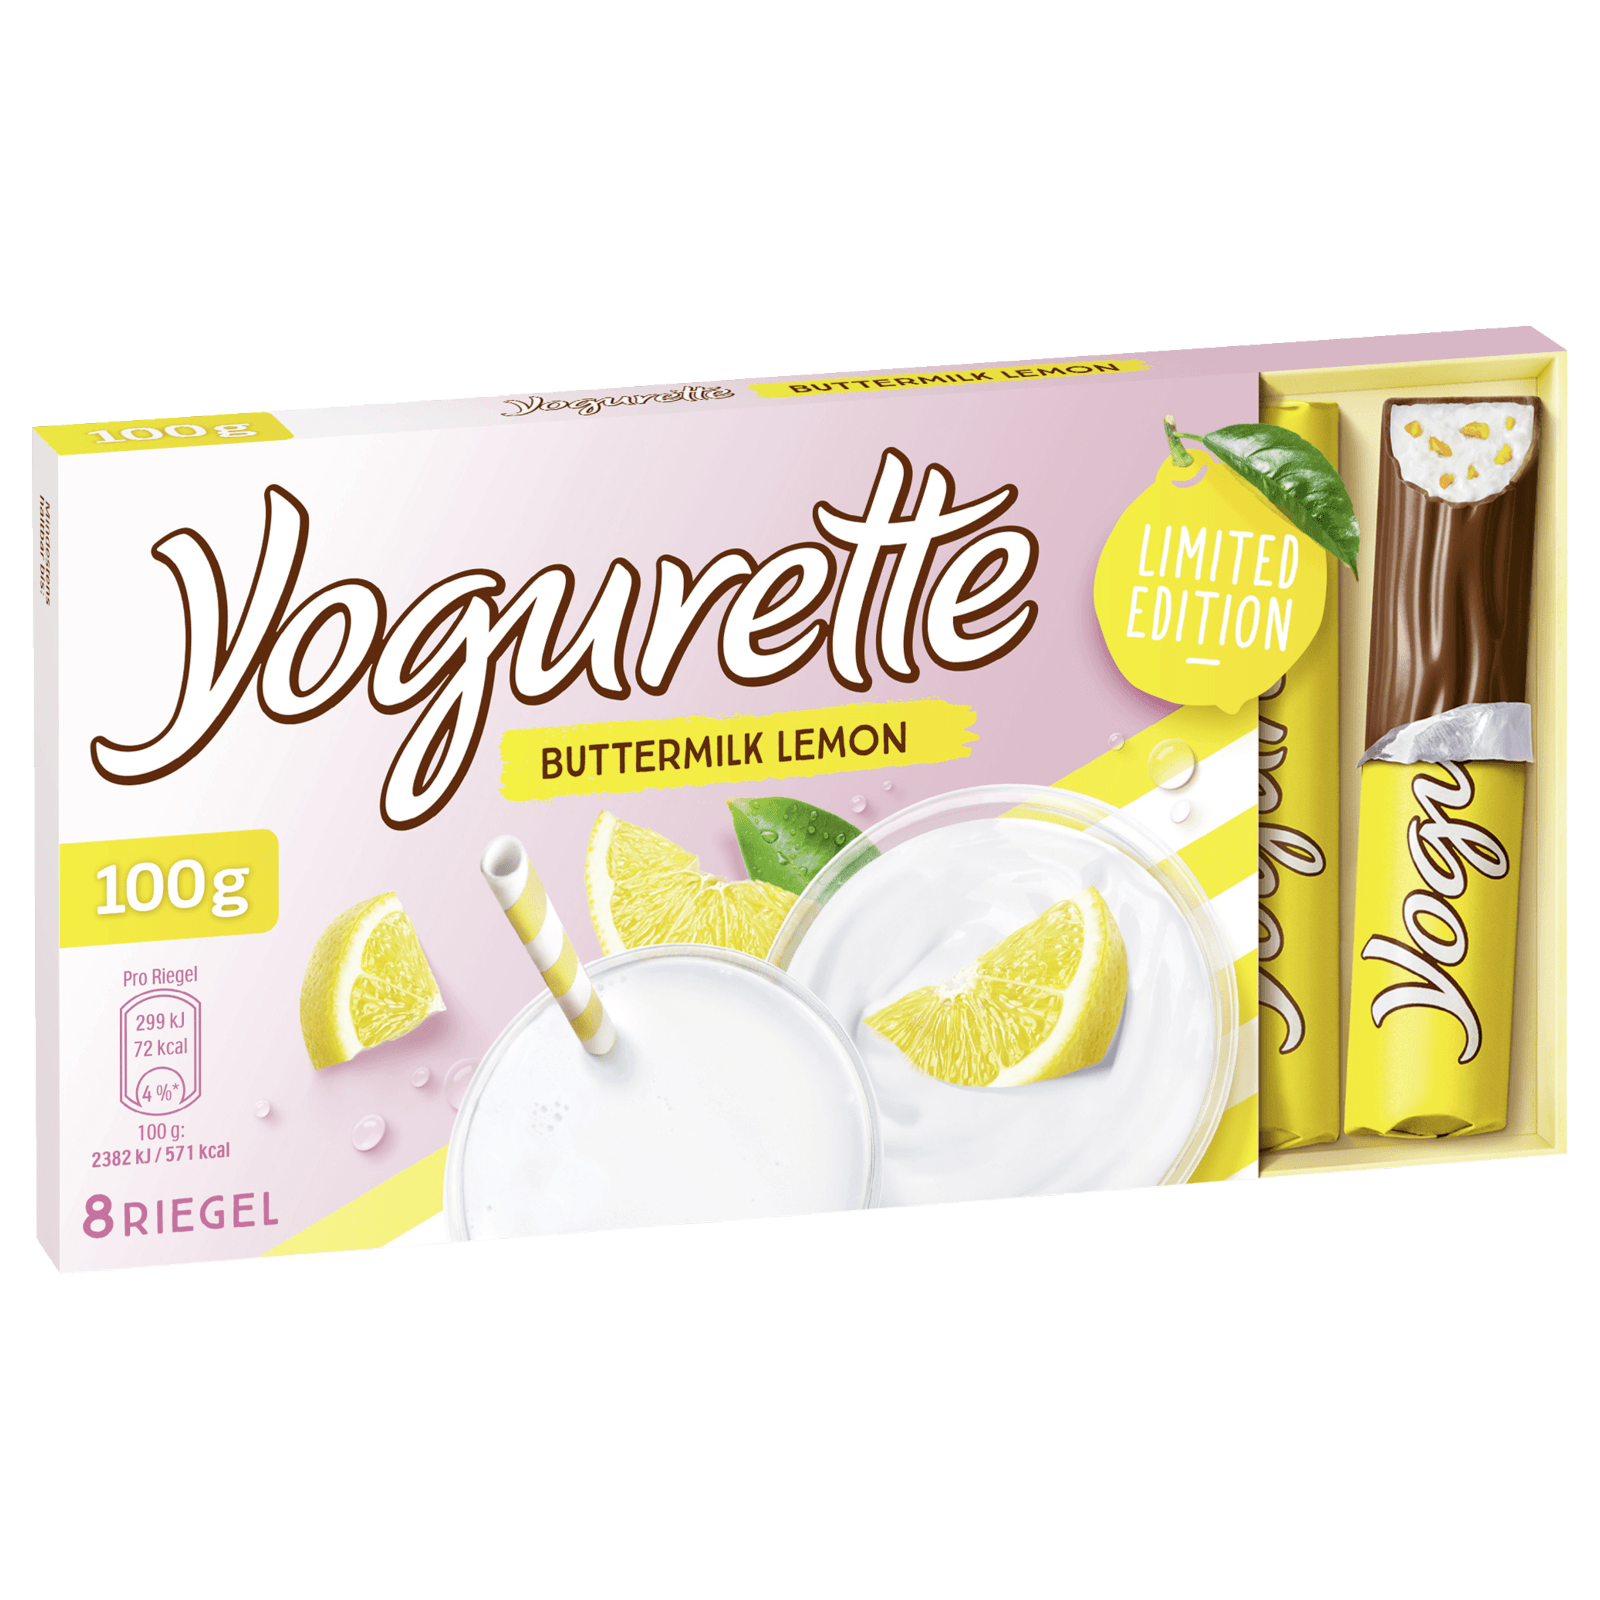 Yogurette Buttermilk Lemon 100g Bei Rewe Online Bestellen